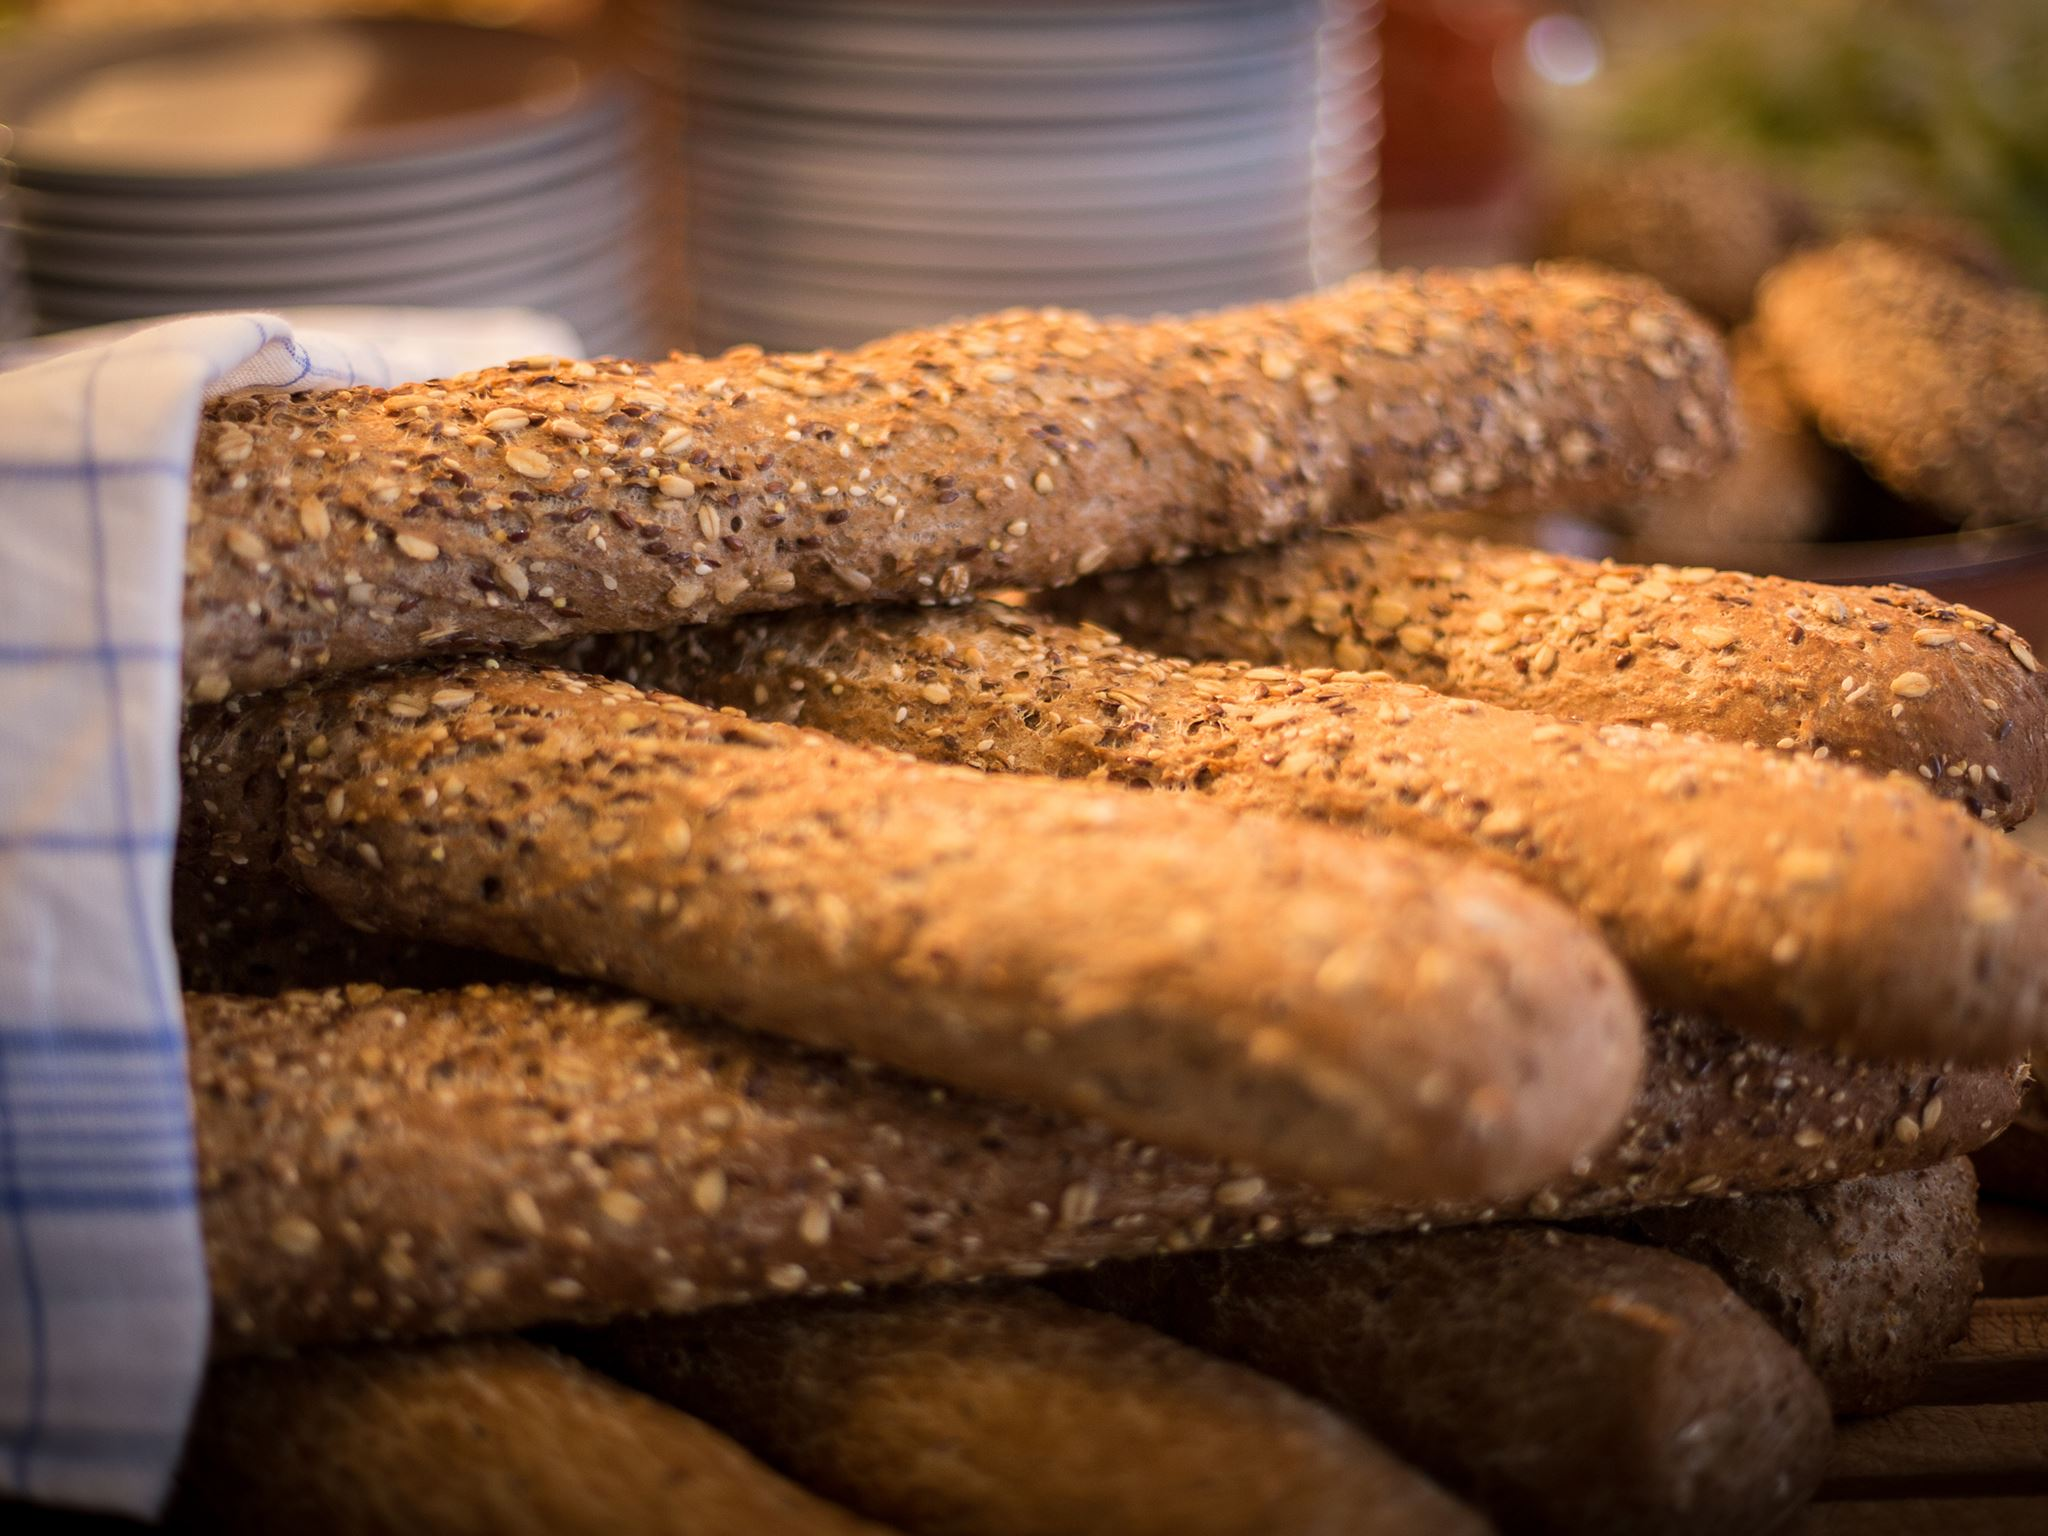 Ferskt hjemmebakt brød